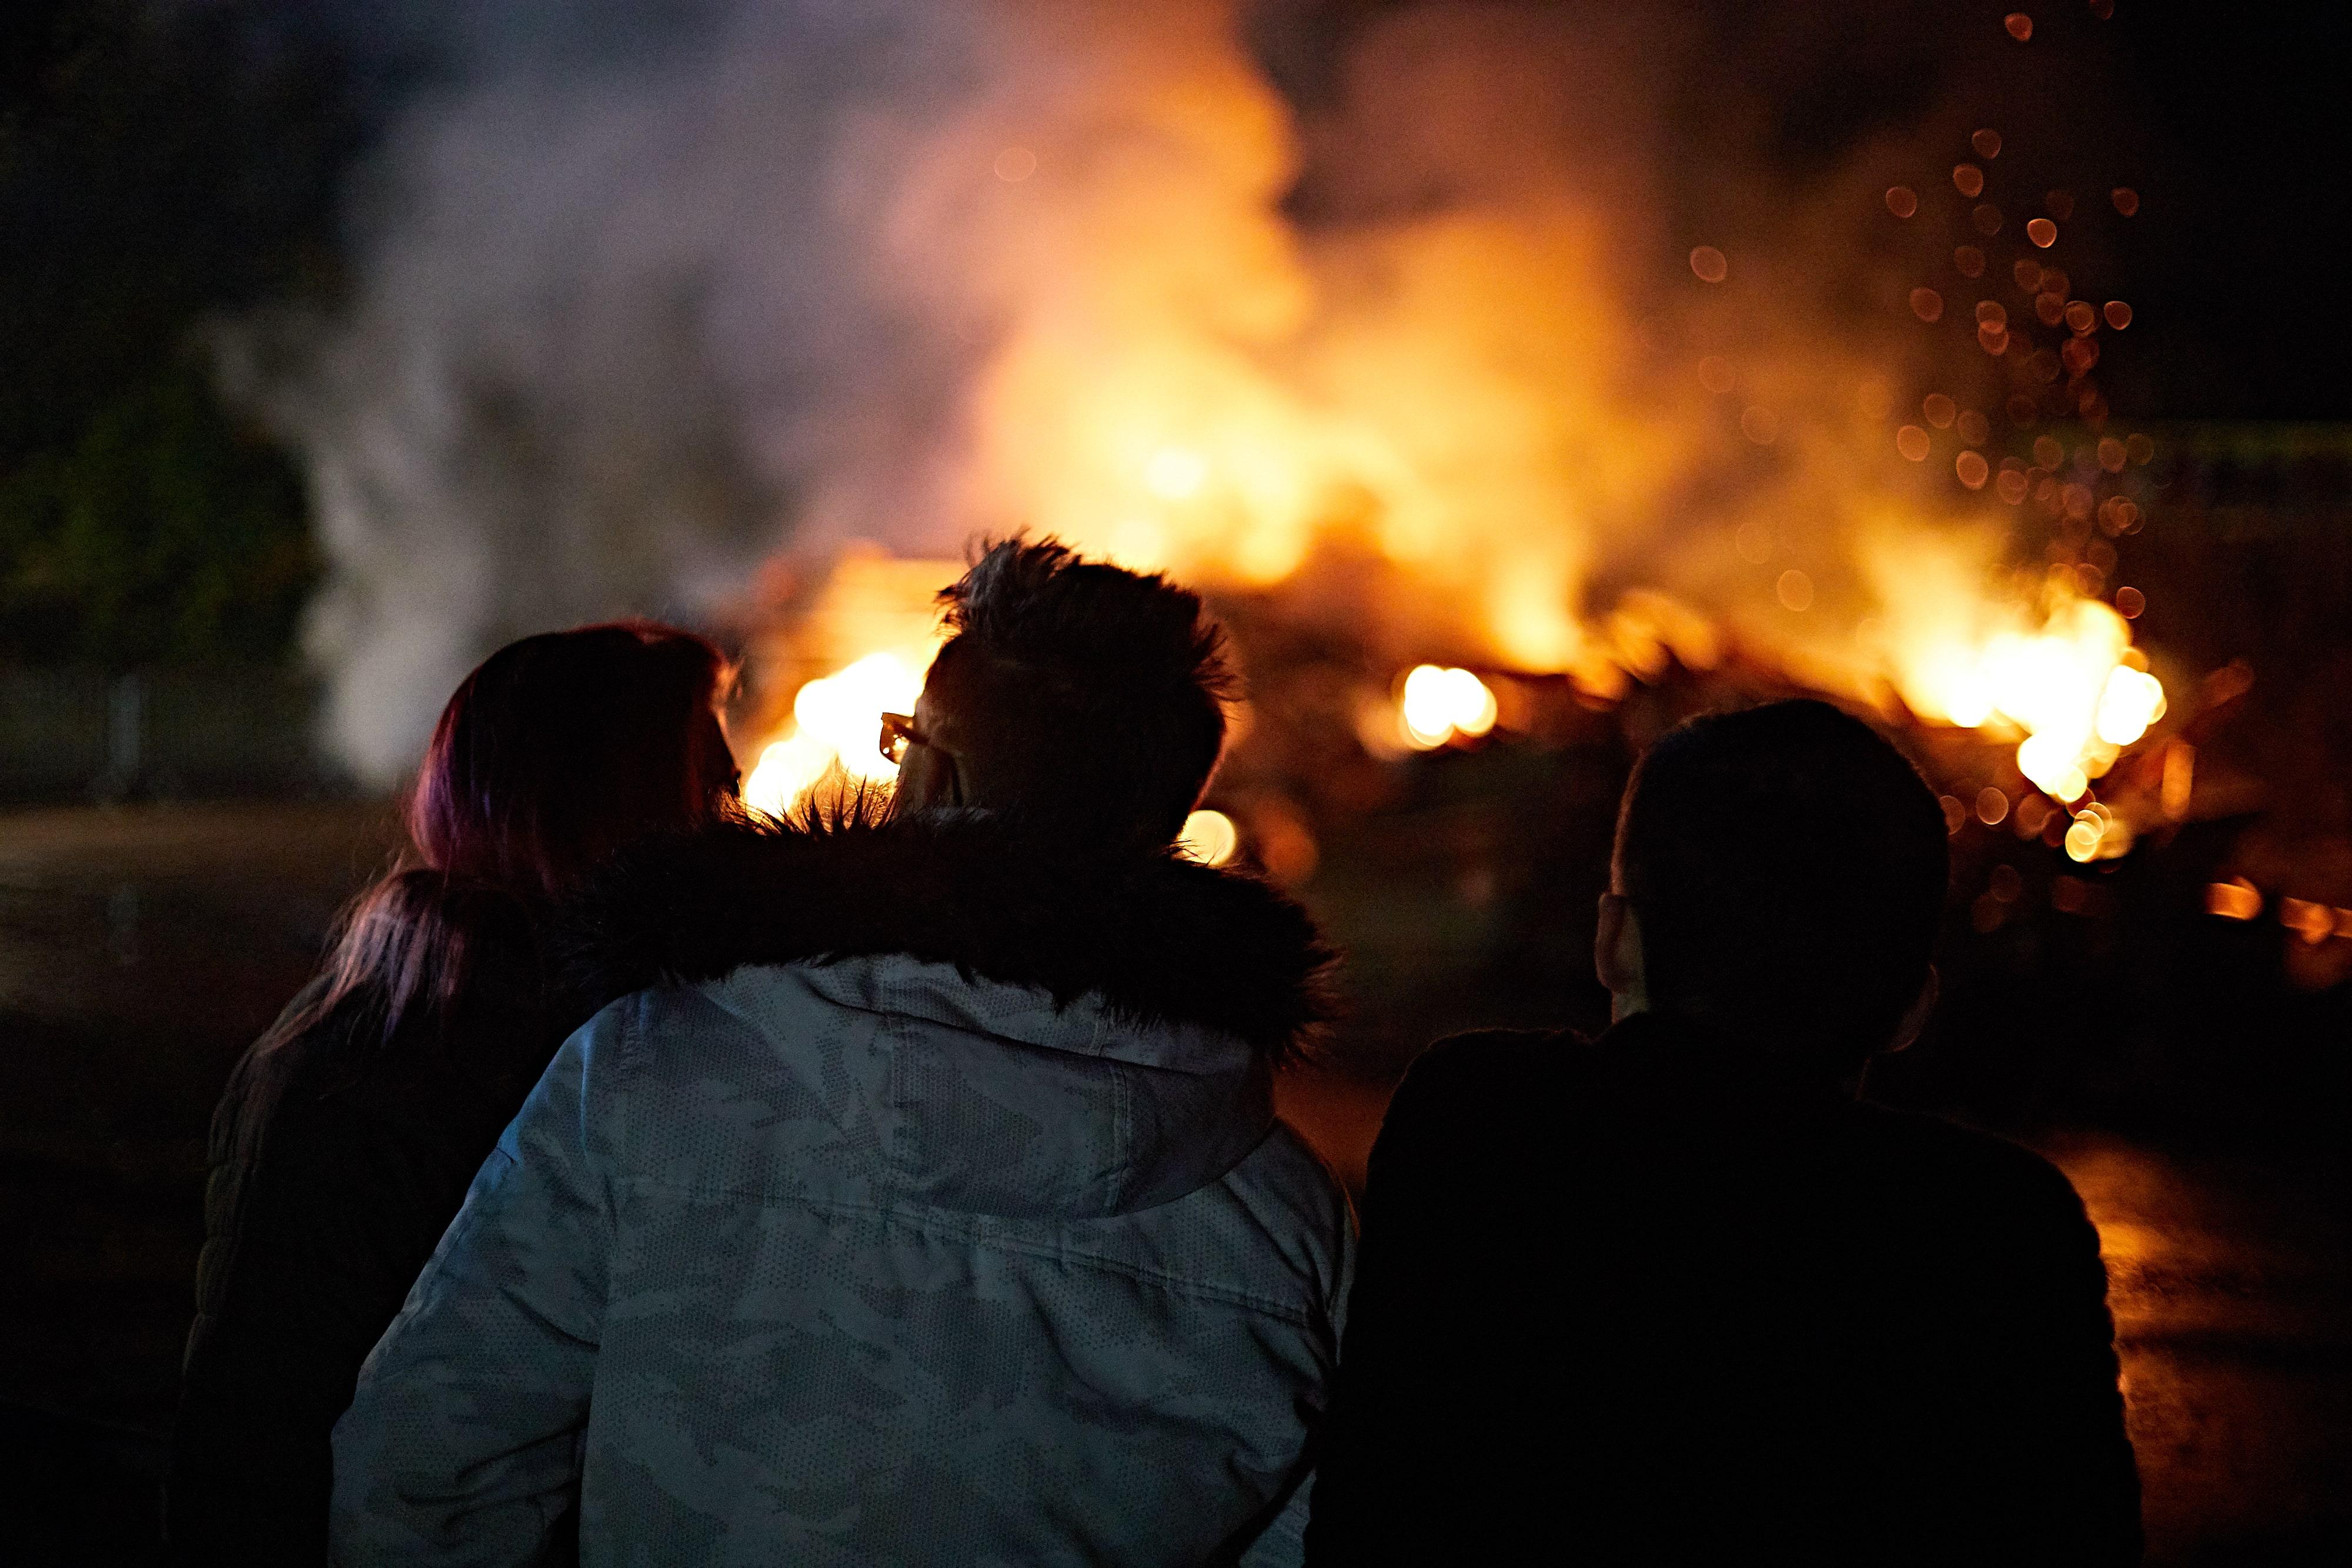 Having a good time at Bonfire Night